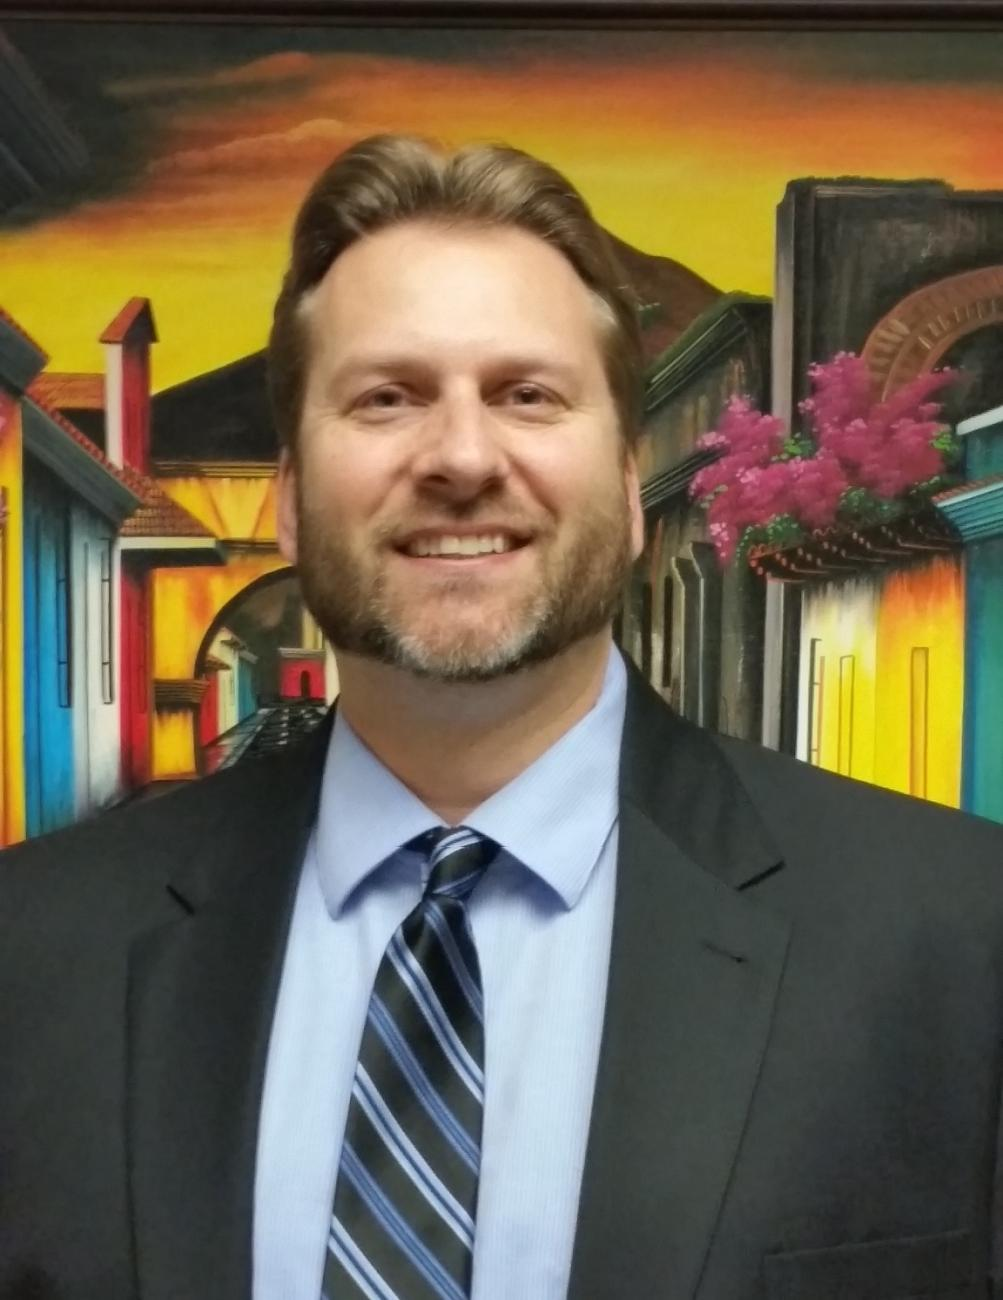 Southern Regional Center Director Richard Hayner